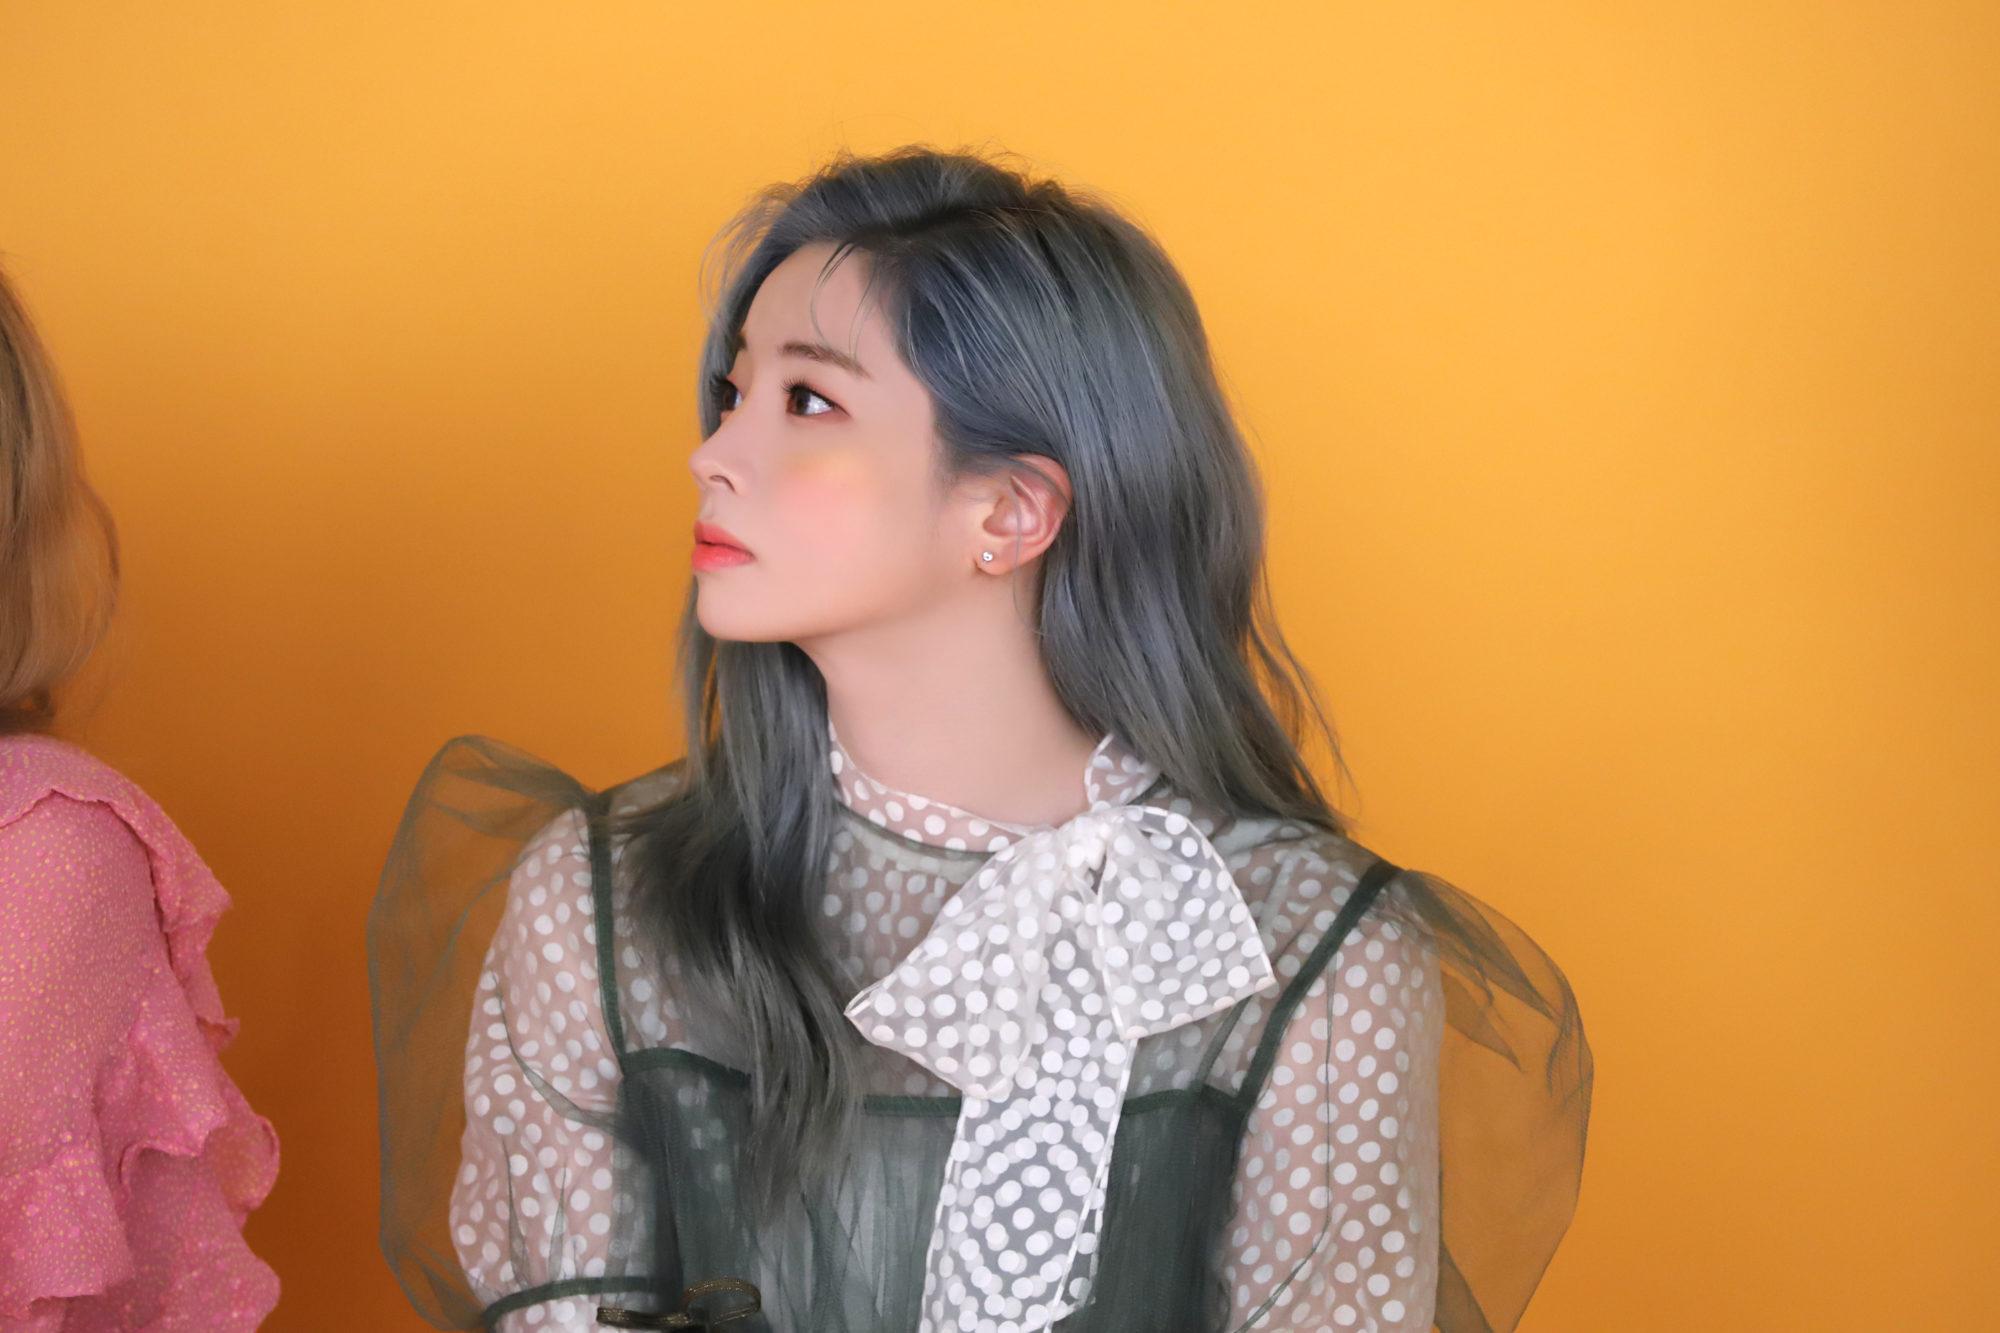 Twice Allure Dahyun 2019 HD